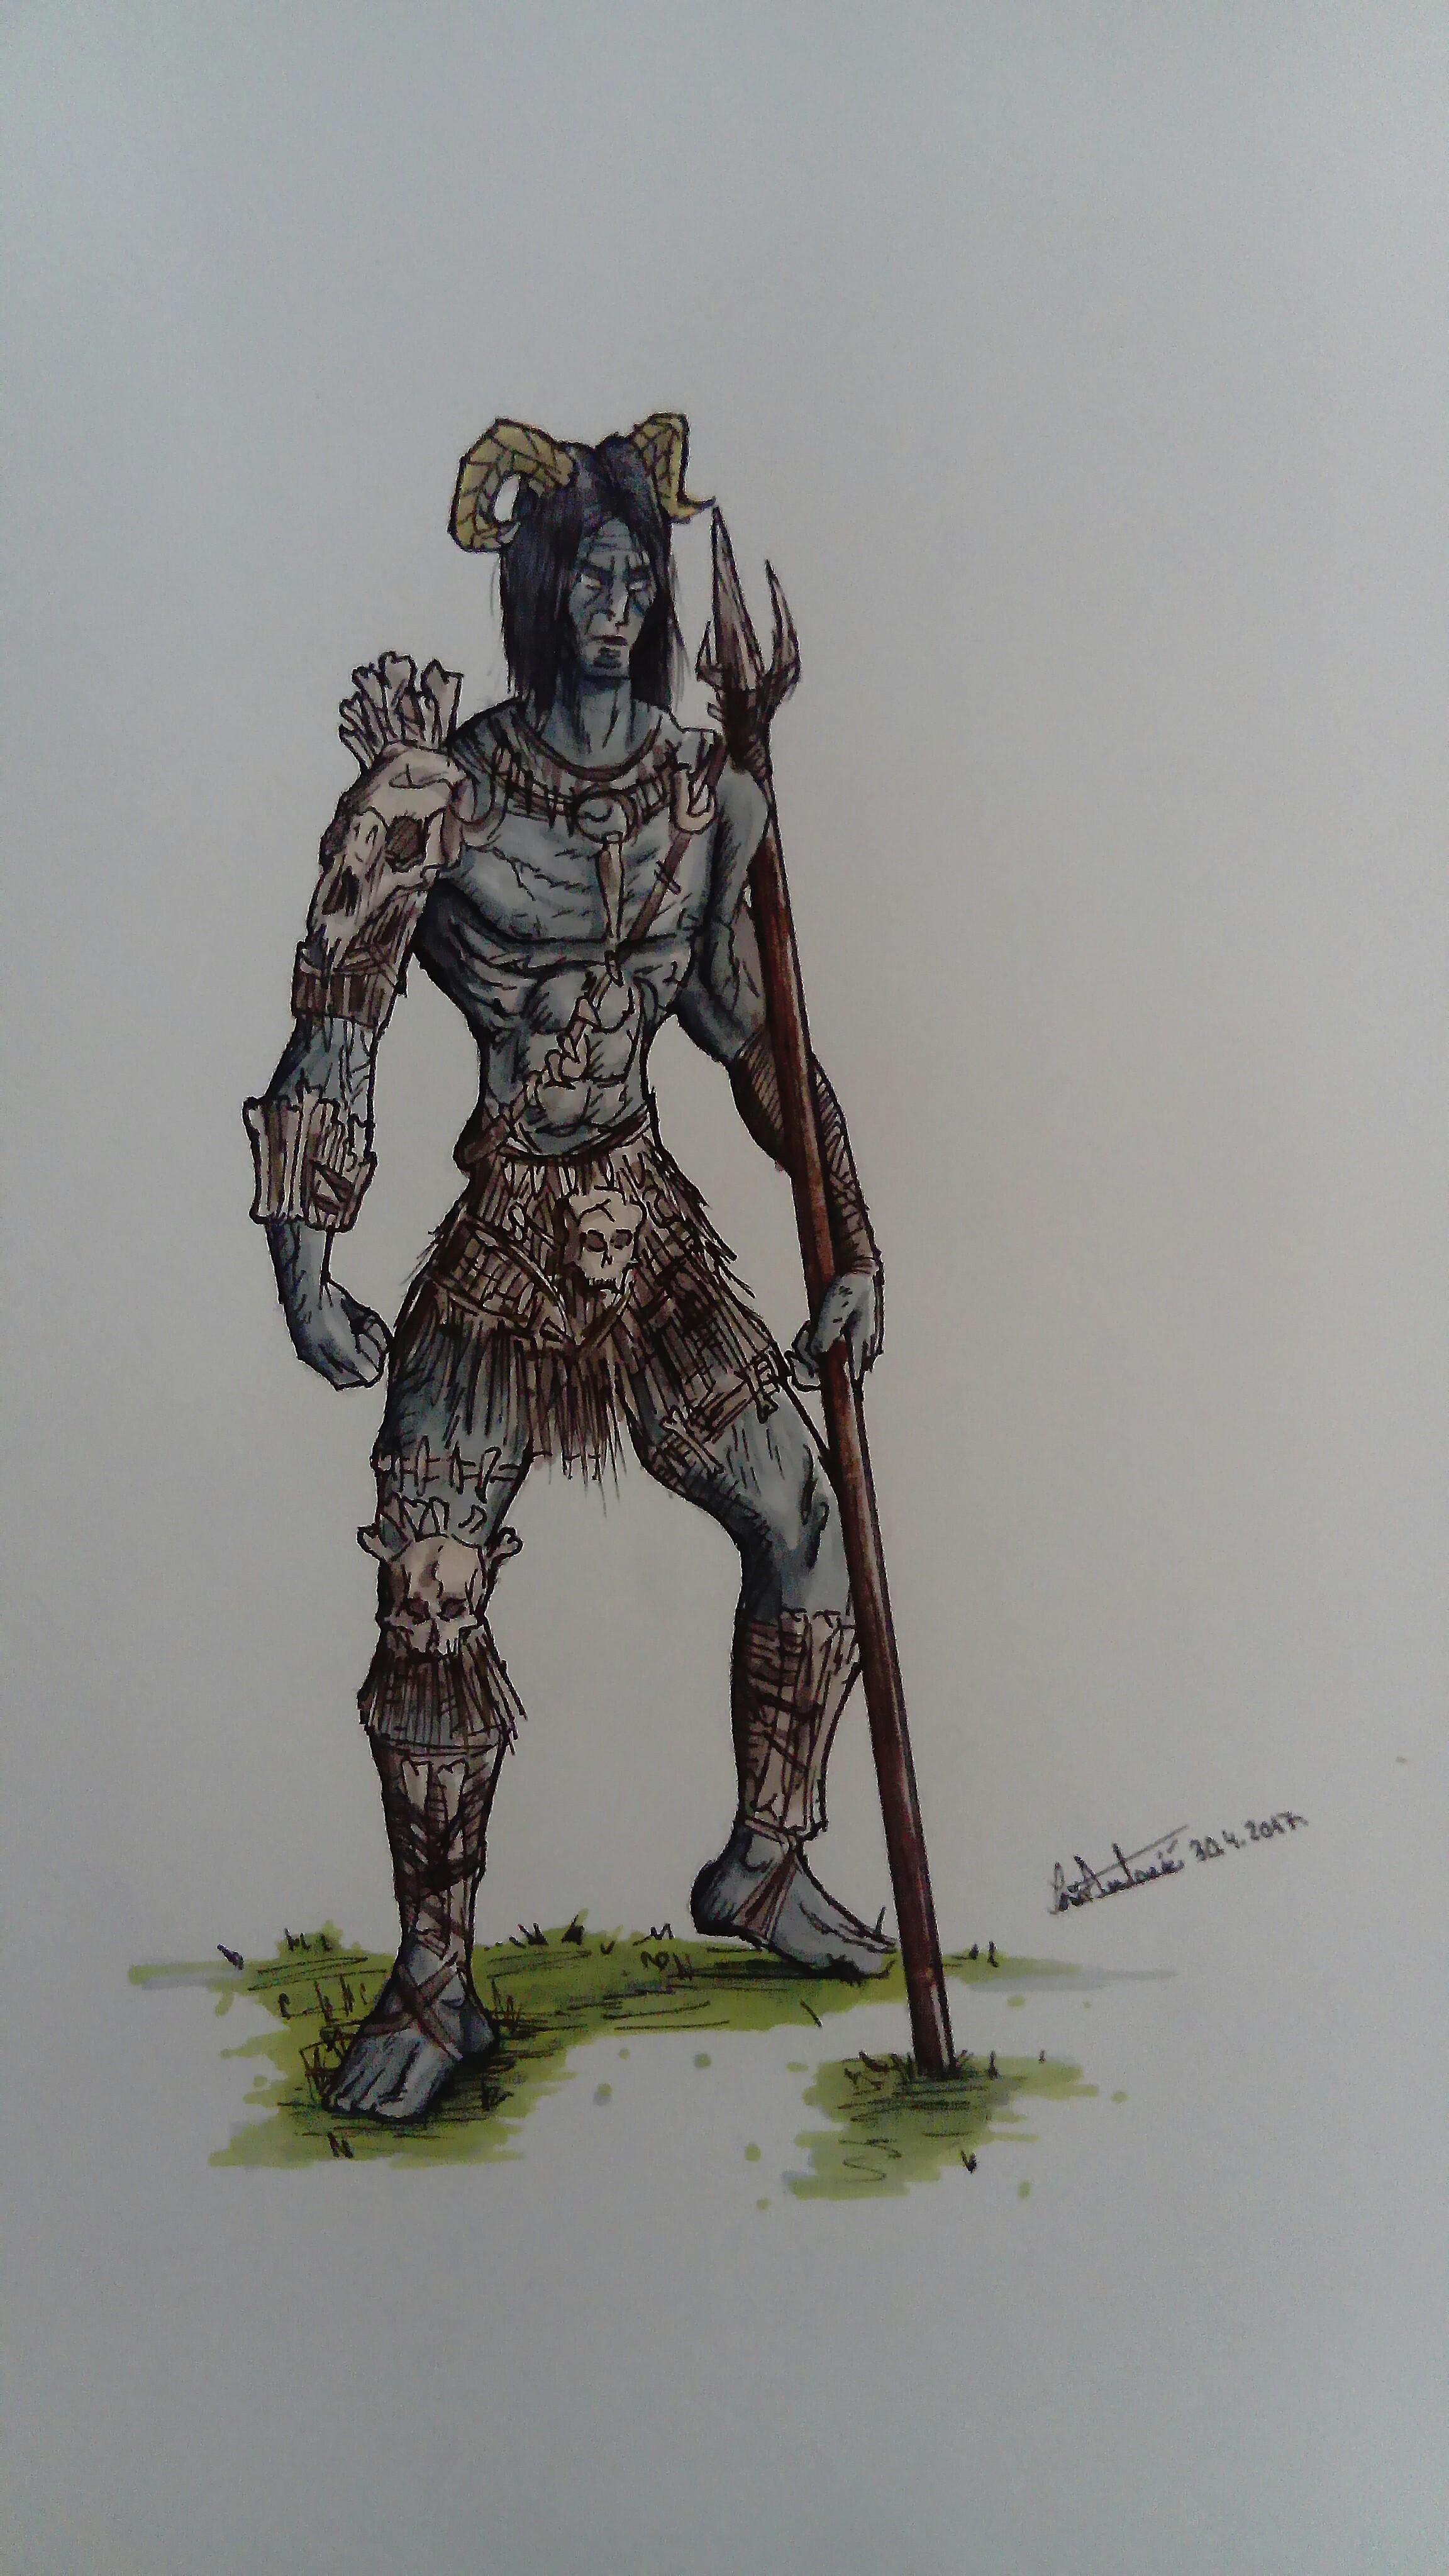 A tall humanoid with bone armor